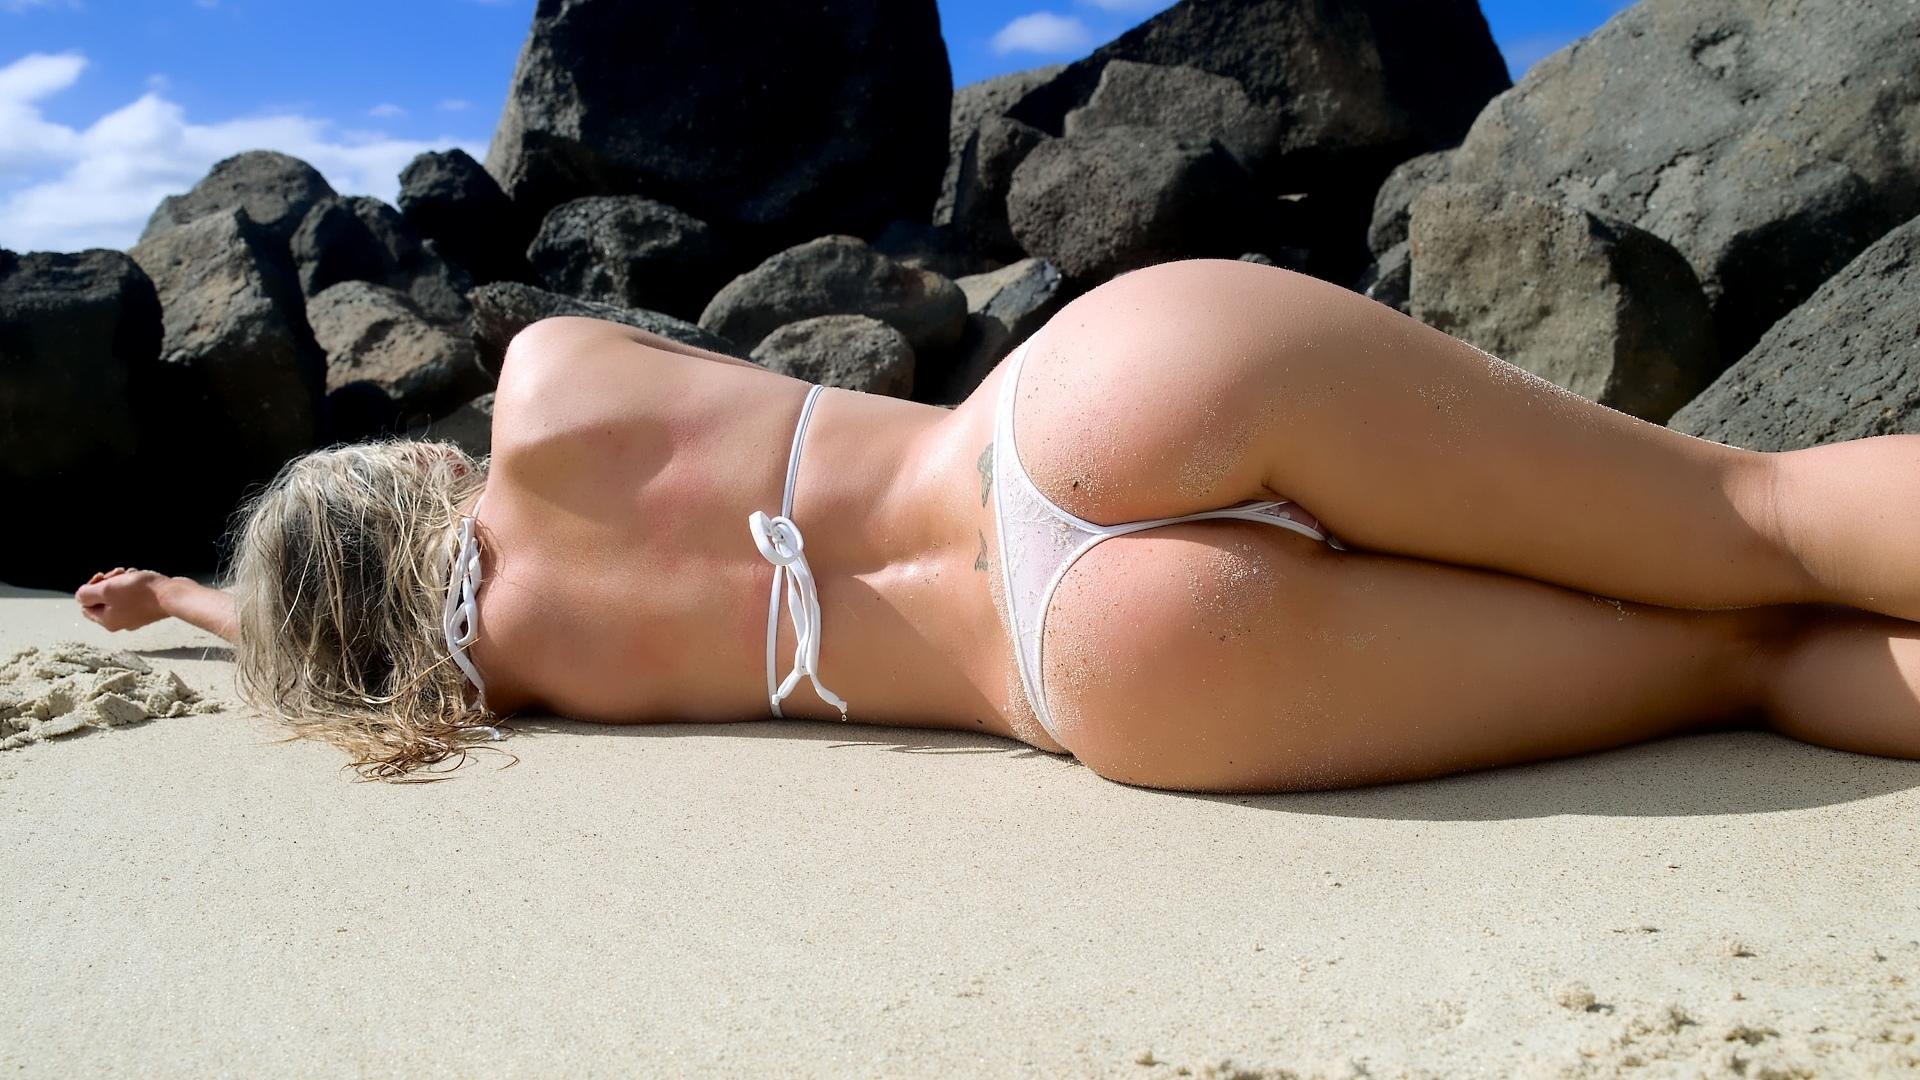 ass-bikini-video